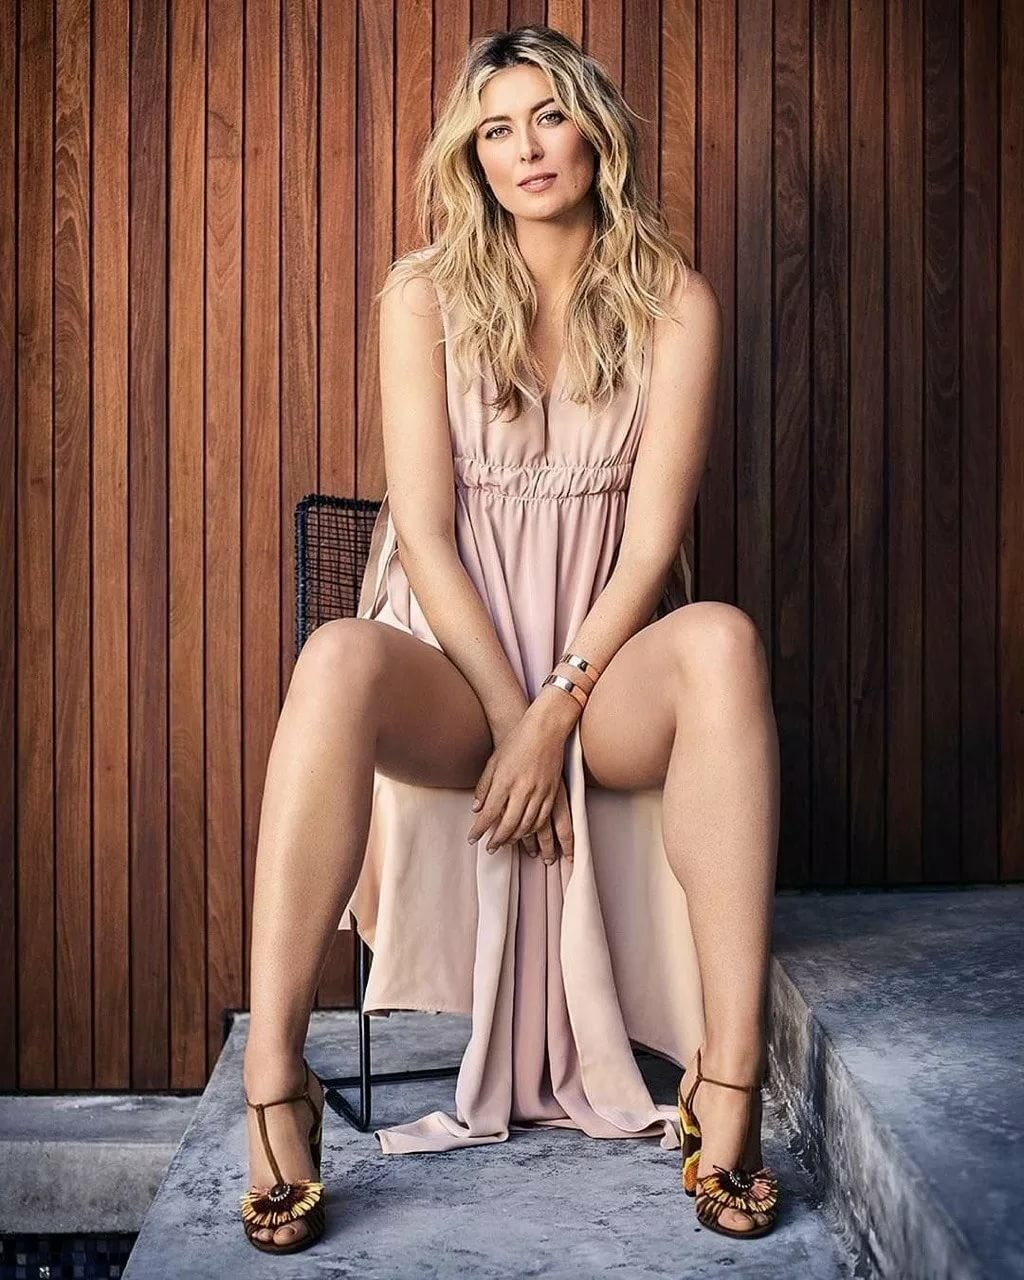 Sexy rosamund pike legs, hardcore sex orgasms